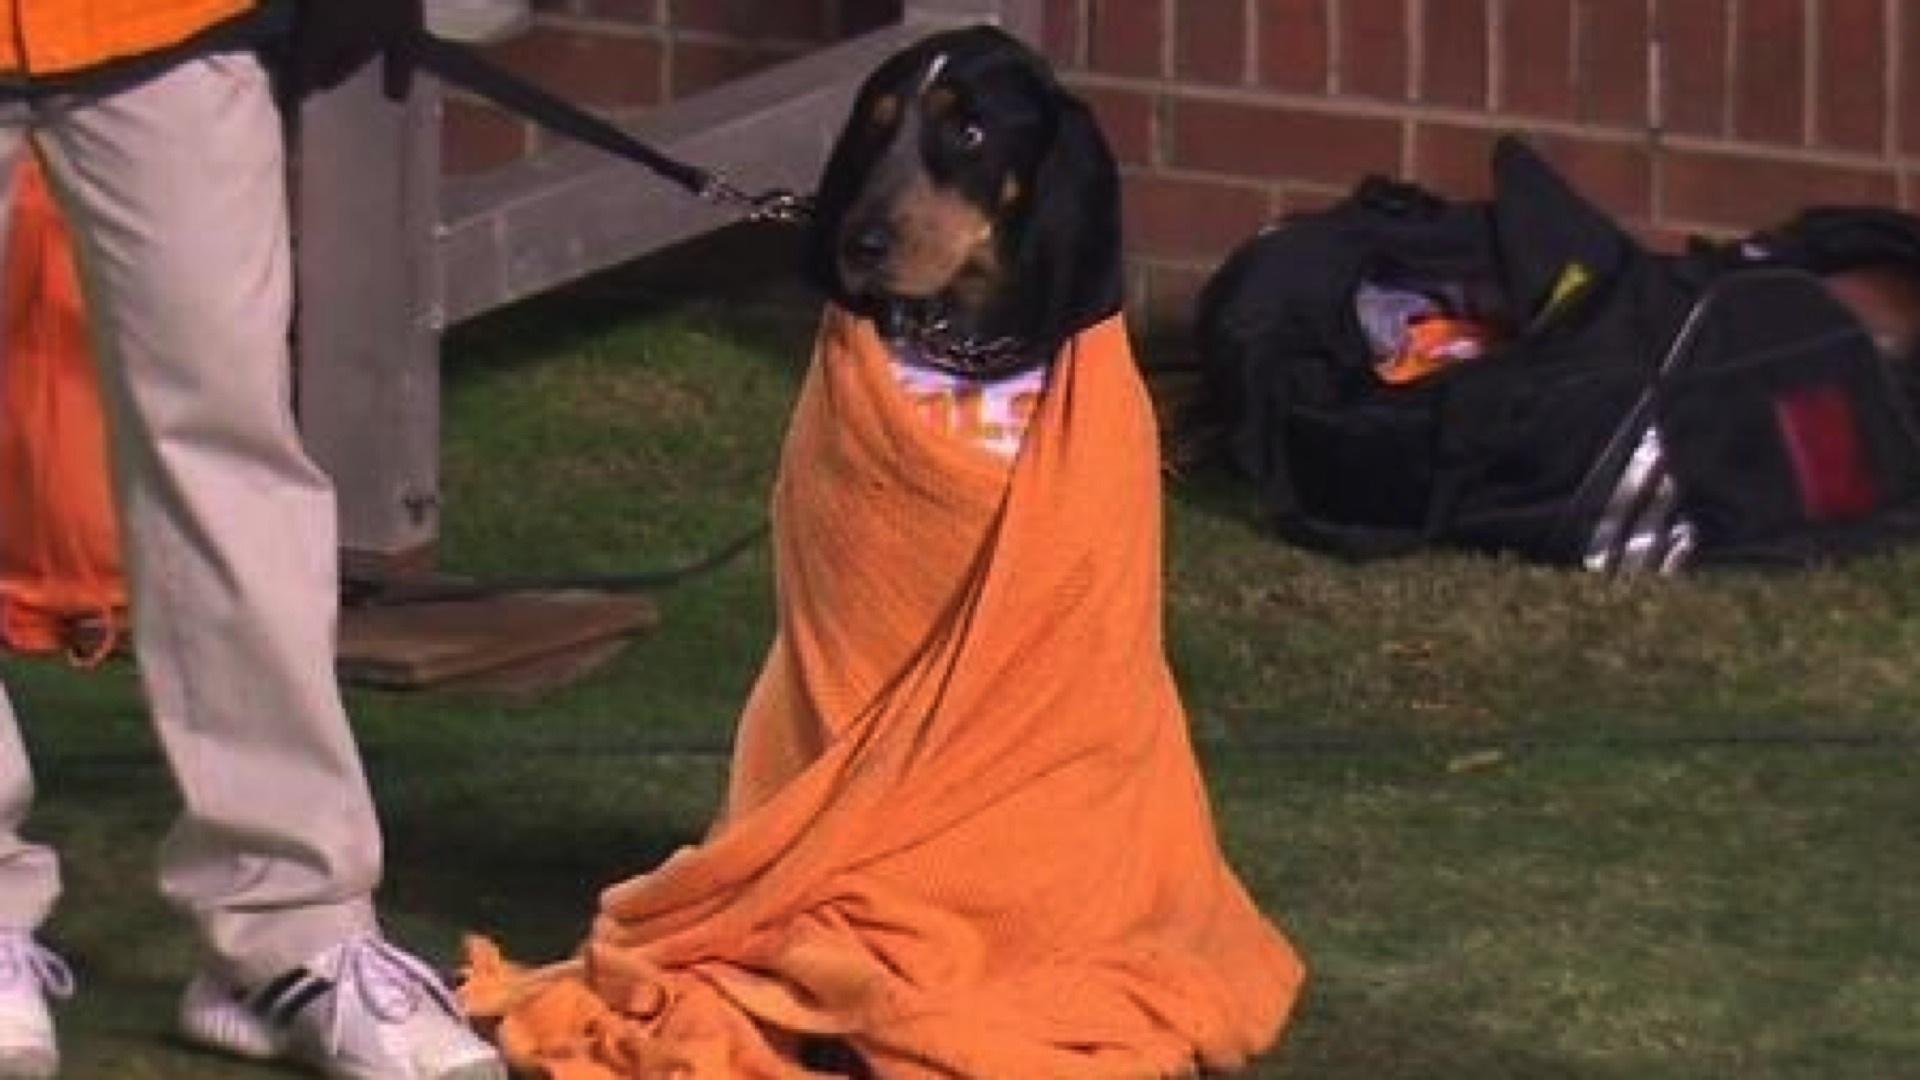 smokey vols 111514 ftr twjpeg_1nl9rspfxt62t1o61brno6r3ej?t= 1243092879&w=960&quality=70 volunteers mascot smokey the dog snuggles in blanket, is super